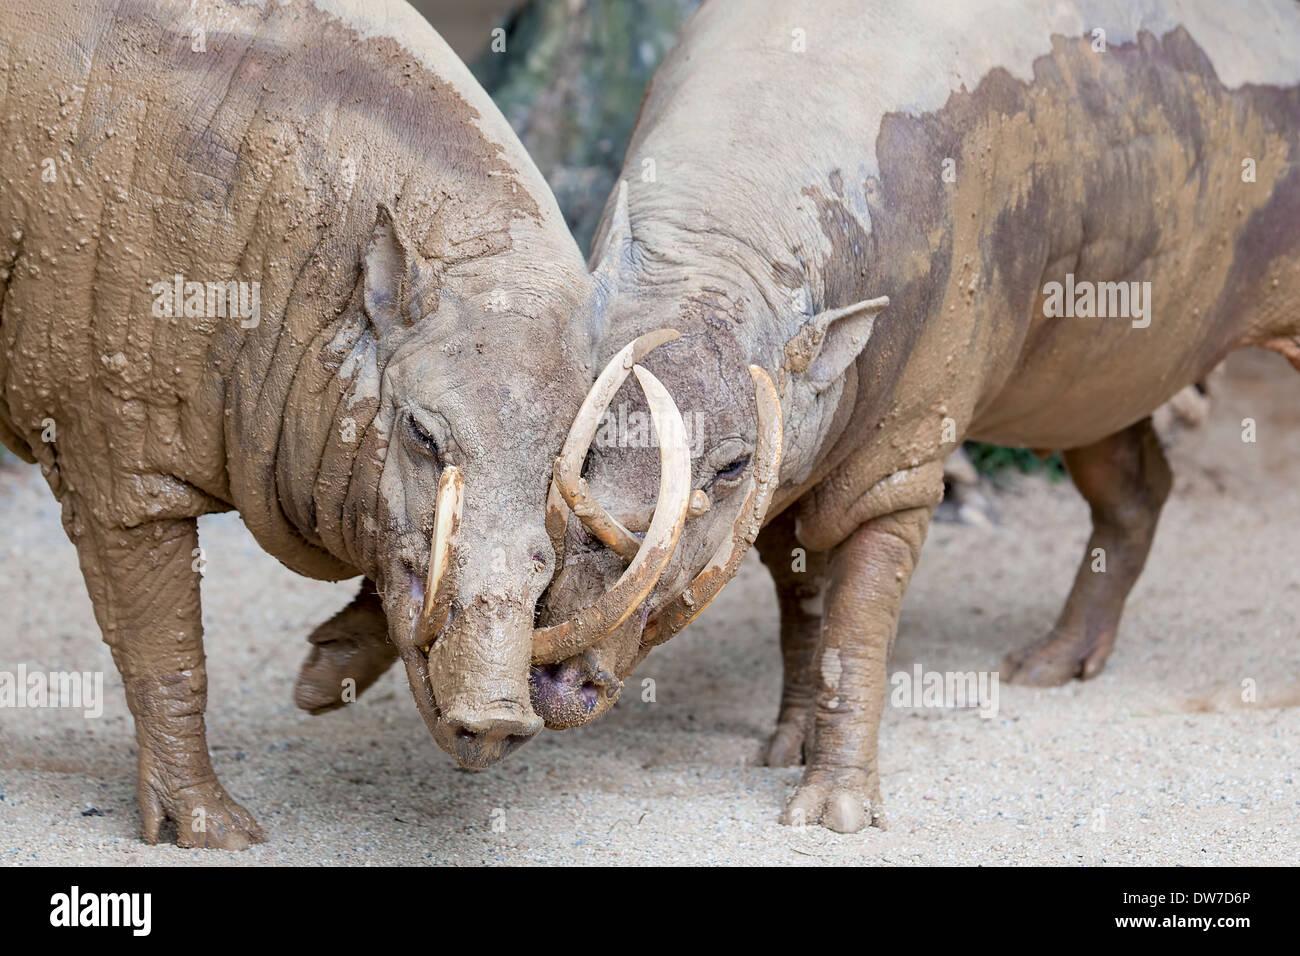 Babirusa Deer-Pig Wild Boar from Indonesia Pair Snuggling Closeup Portrait - Stock Image